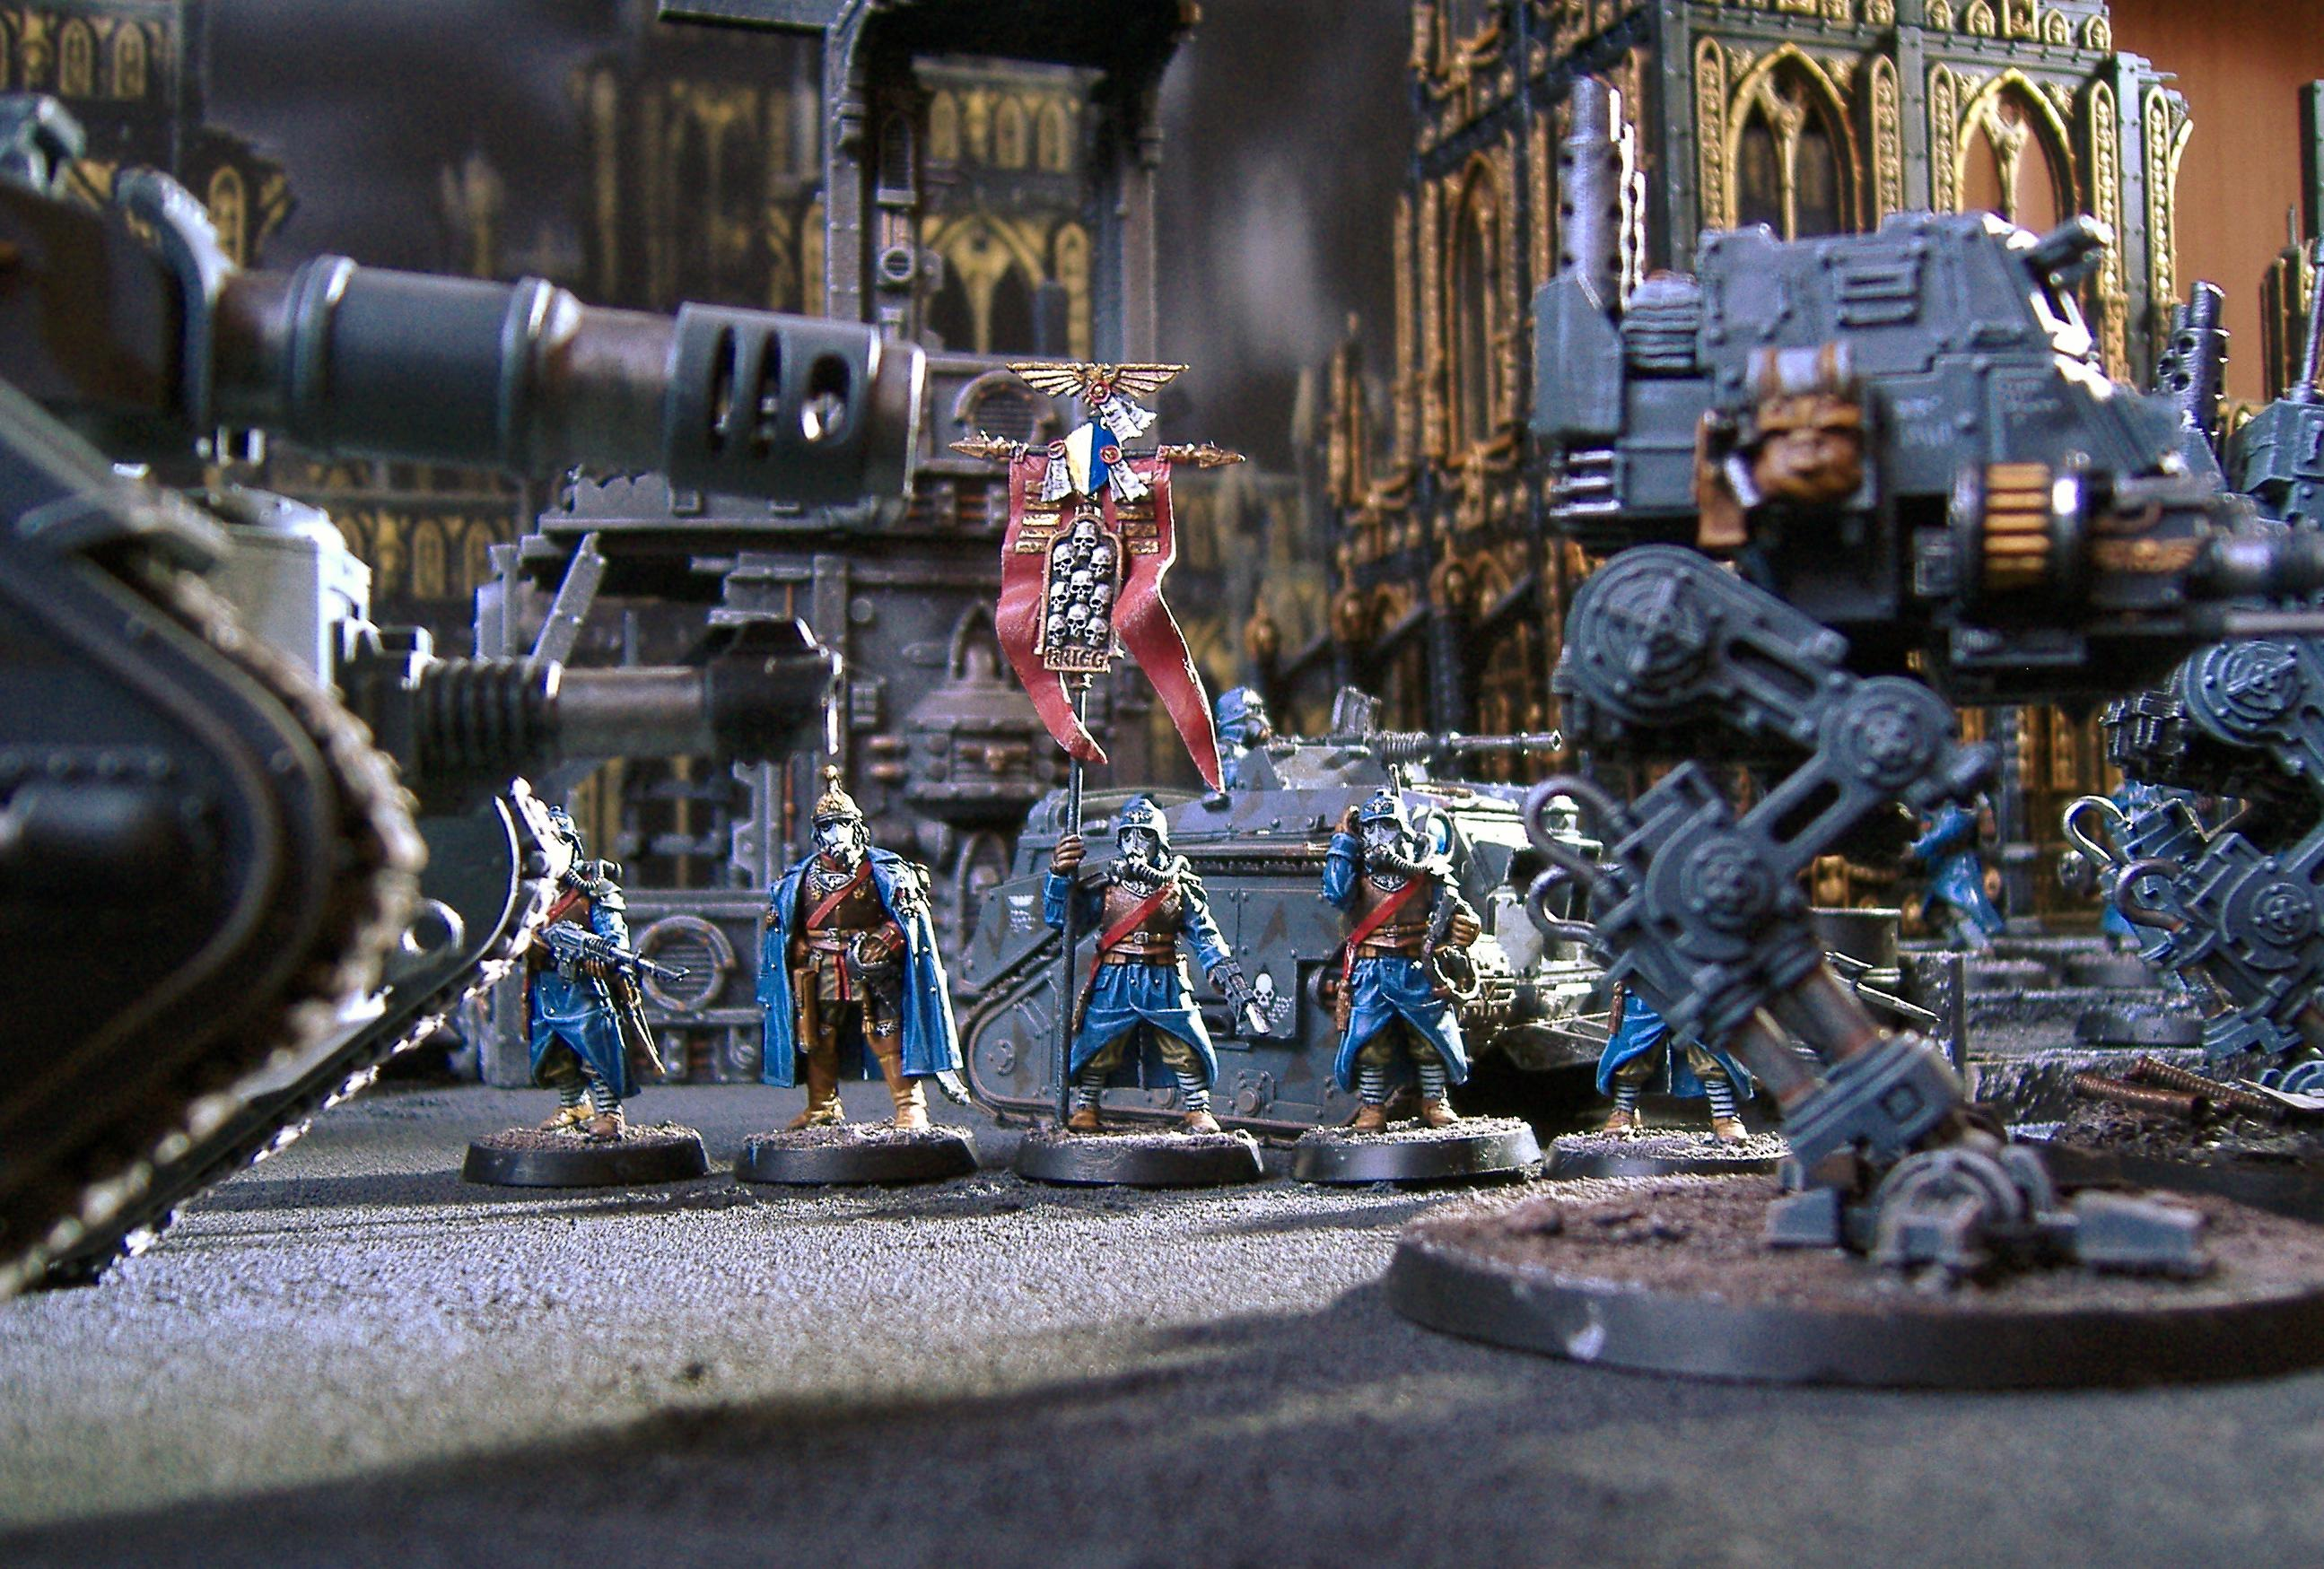 Death, Death Korps of Krieg, Forge World, Guard, Imperial, Imperial Guard, Korps, Leman Russ, Sentinel, Tank, Terrain, Terrains, Warhammer 40,000